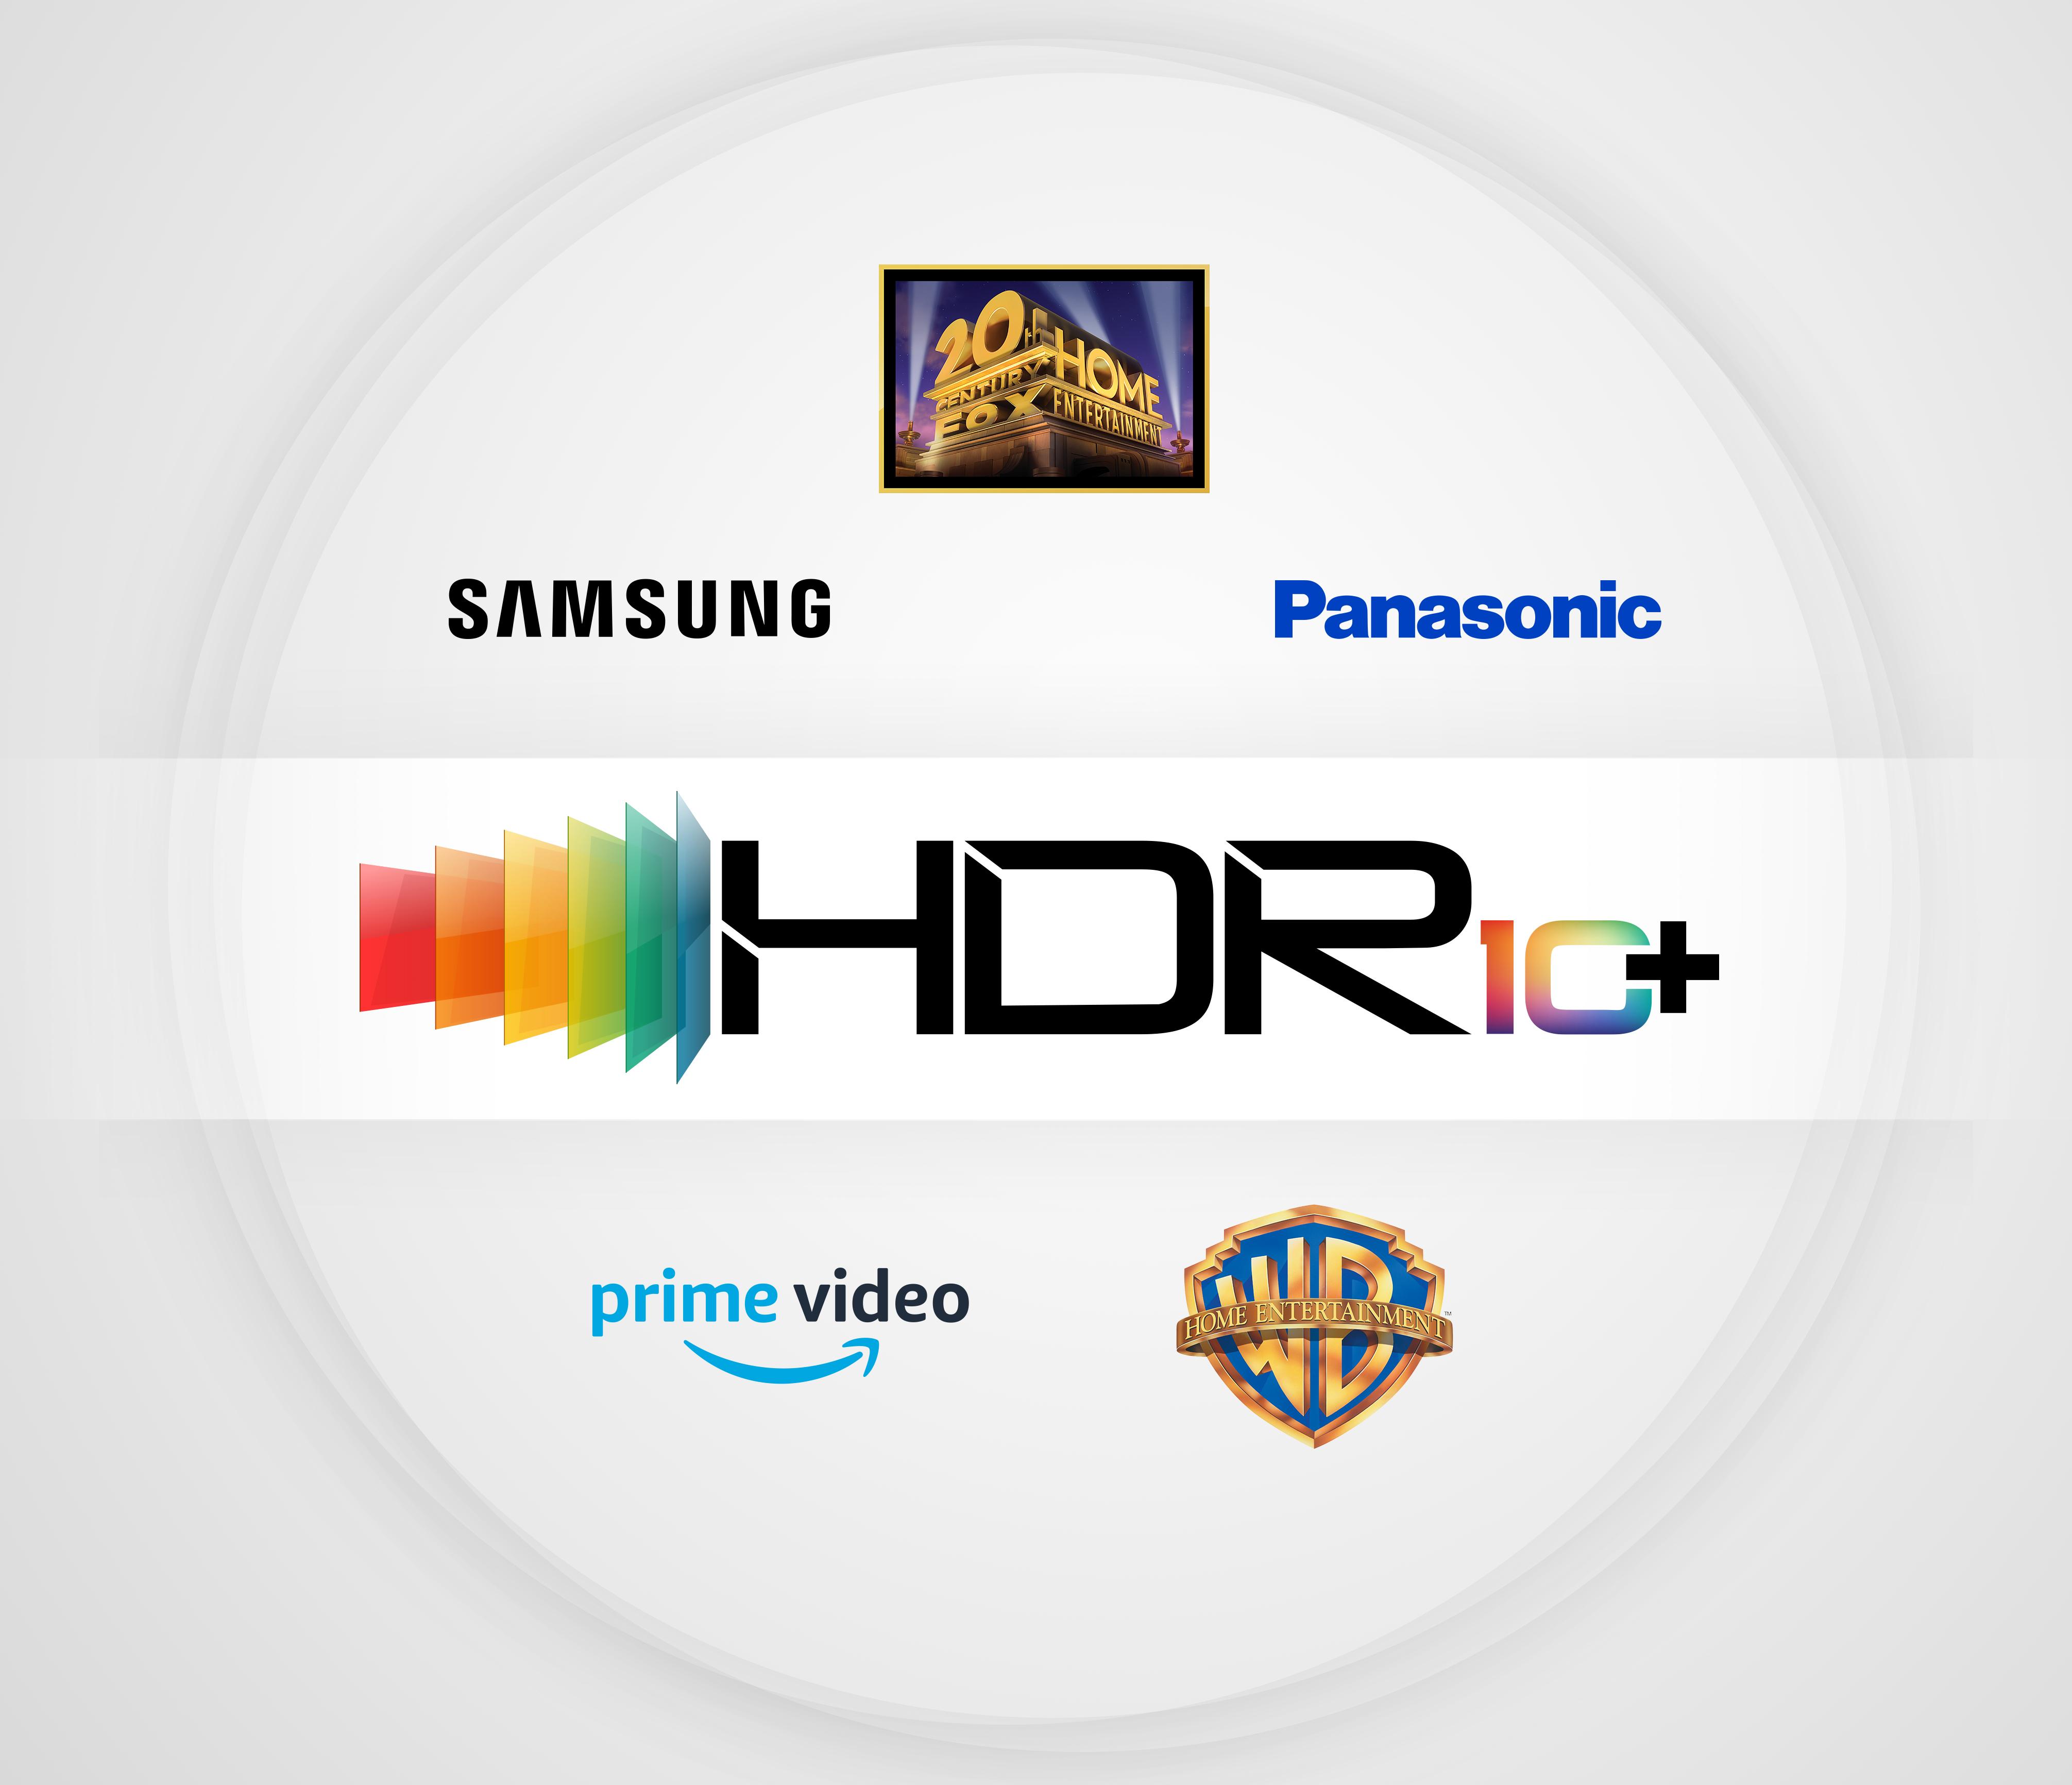 HDR10+ 인증 로고와 HDR10+ 진영에 합류한 5개 회사의 로고- 삼성전자, 파나소닉, 20세기폭스, 아마존(프라임 비디오), 워너브라더스